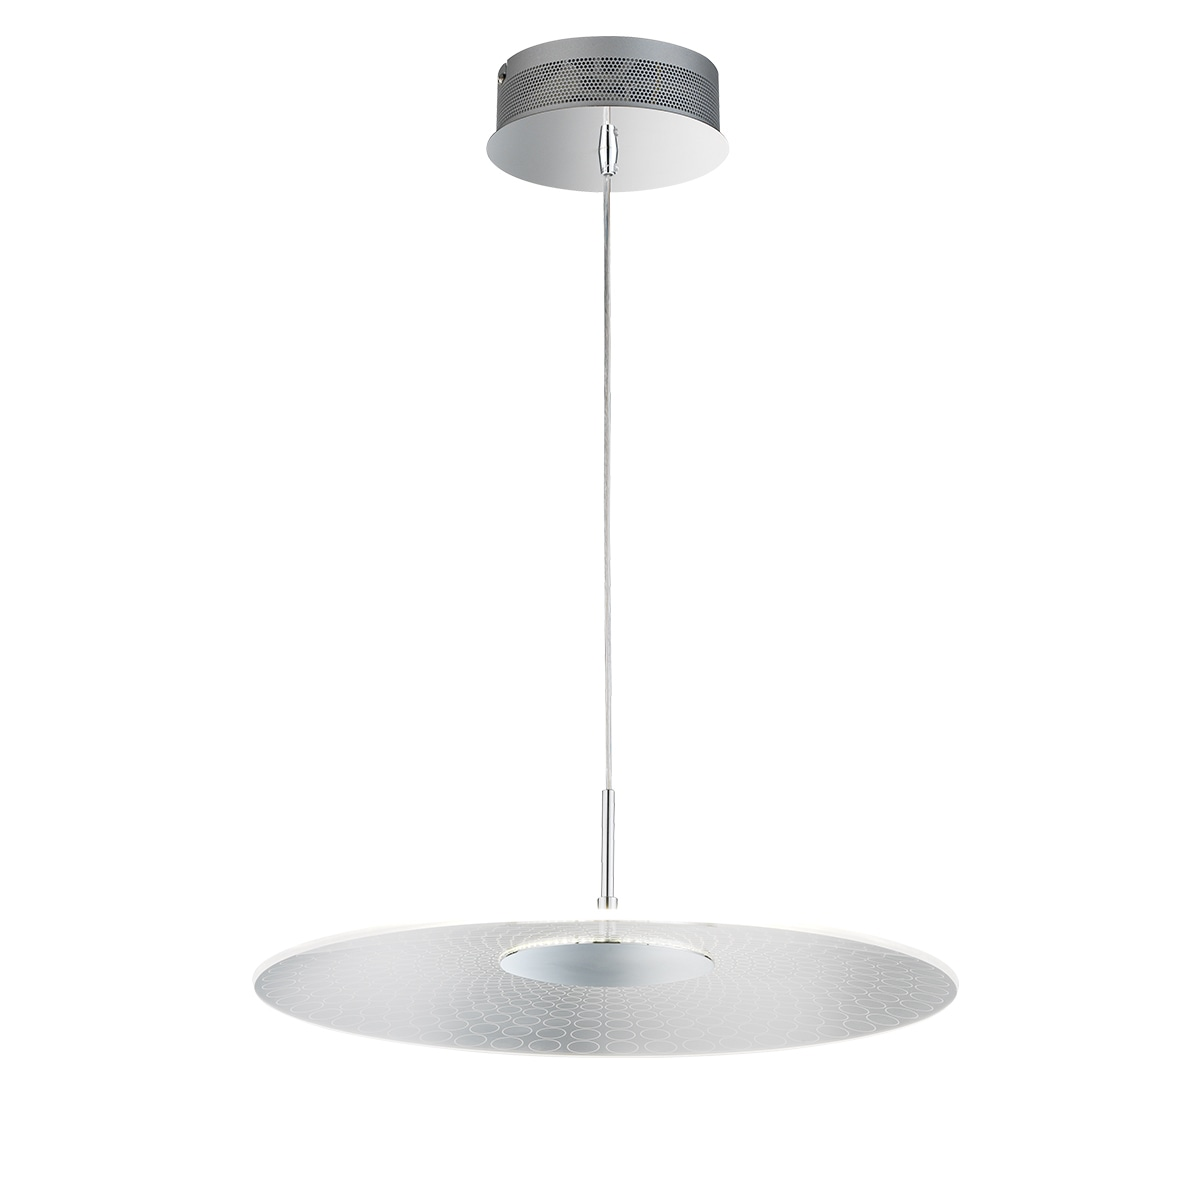 WOFI LED Pendelleuchte Coco, LED-Board, Warmweiß